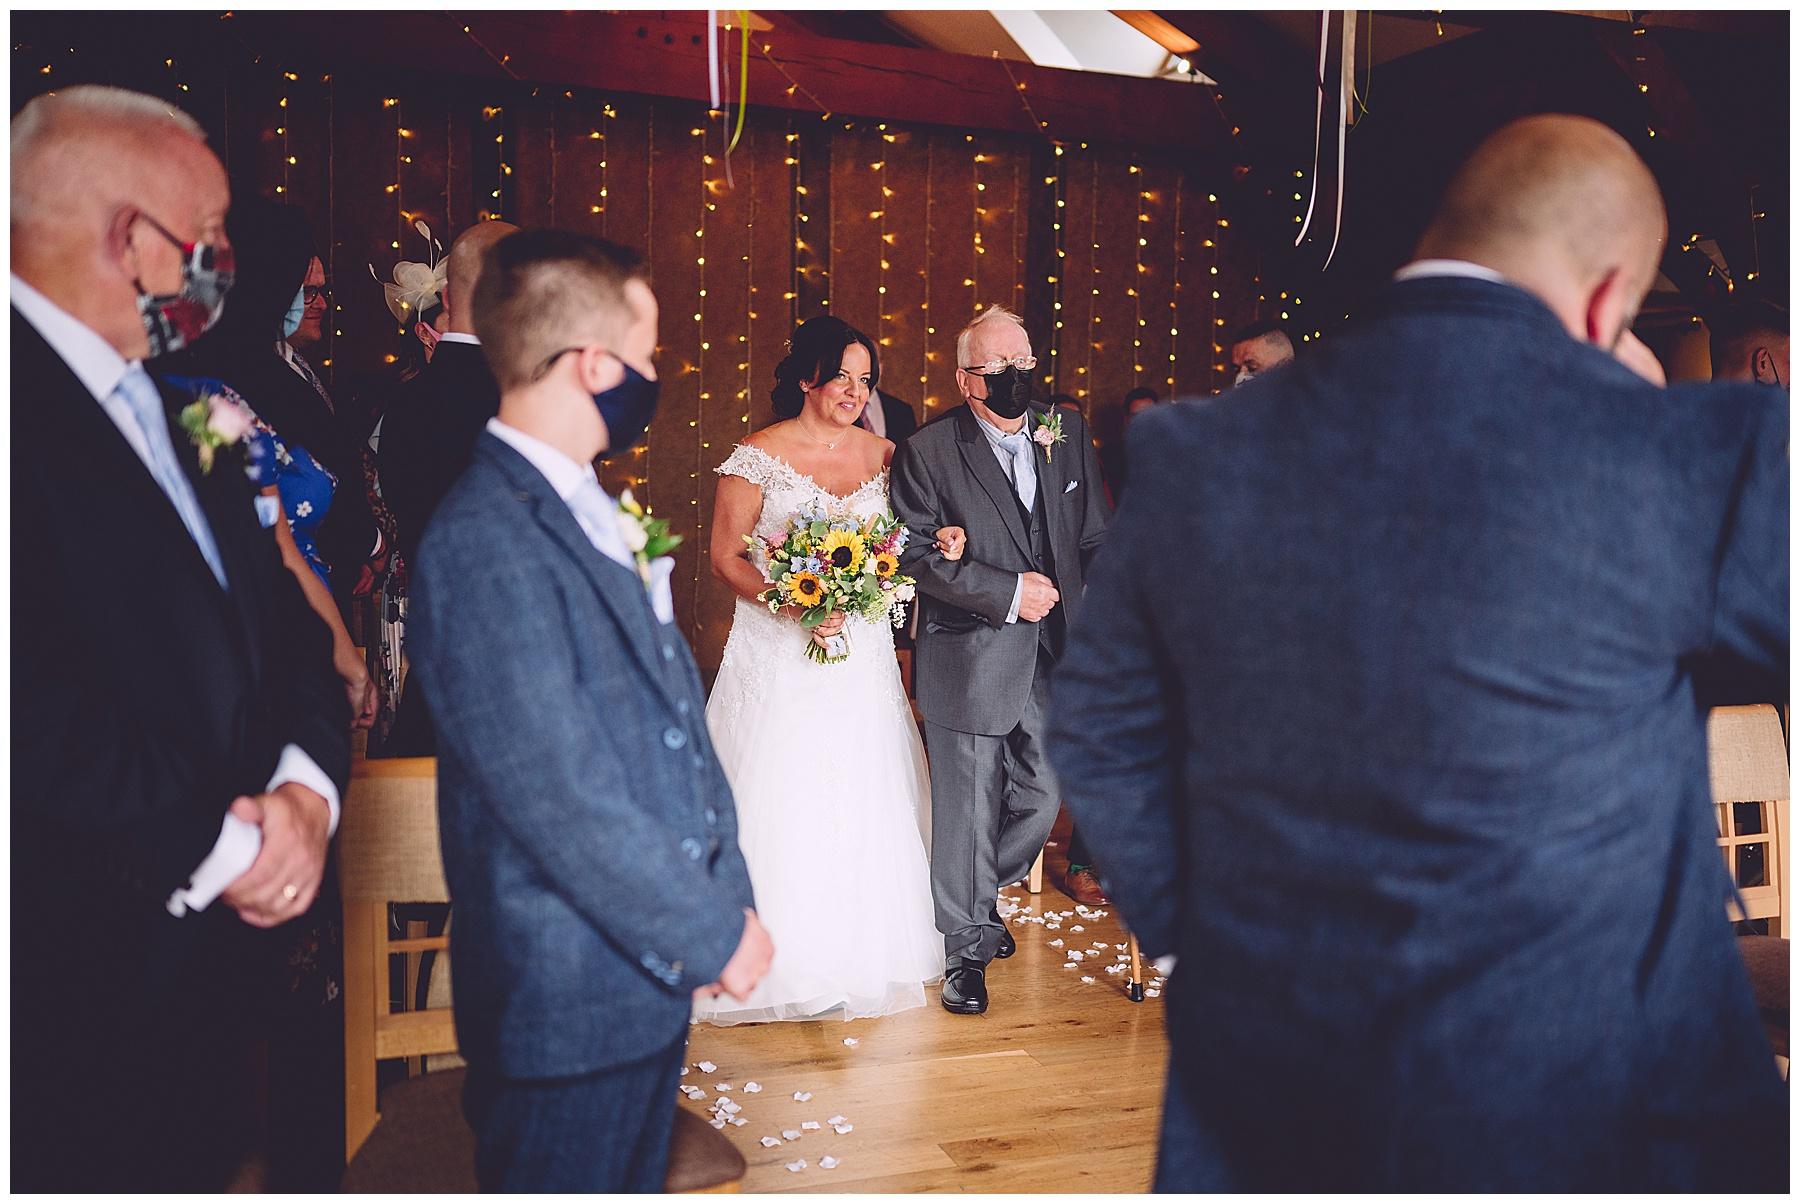 Civil Ceremony at King Arthur Wedding